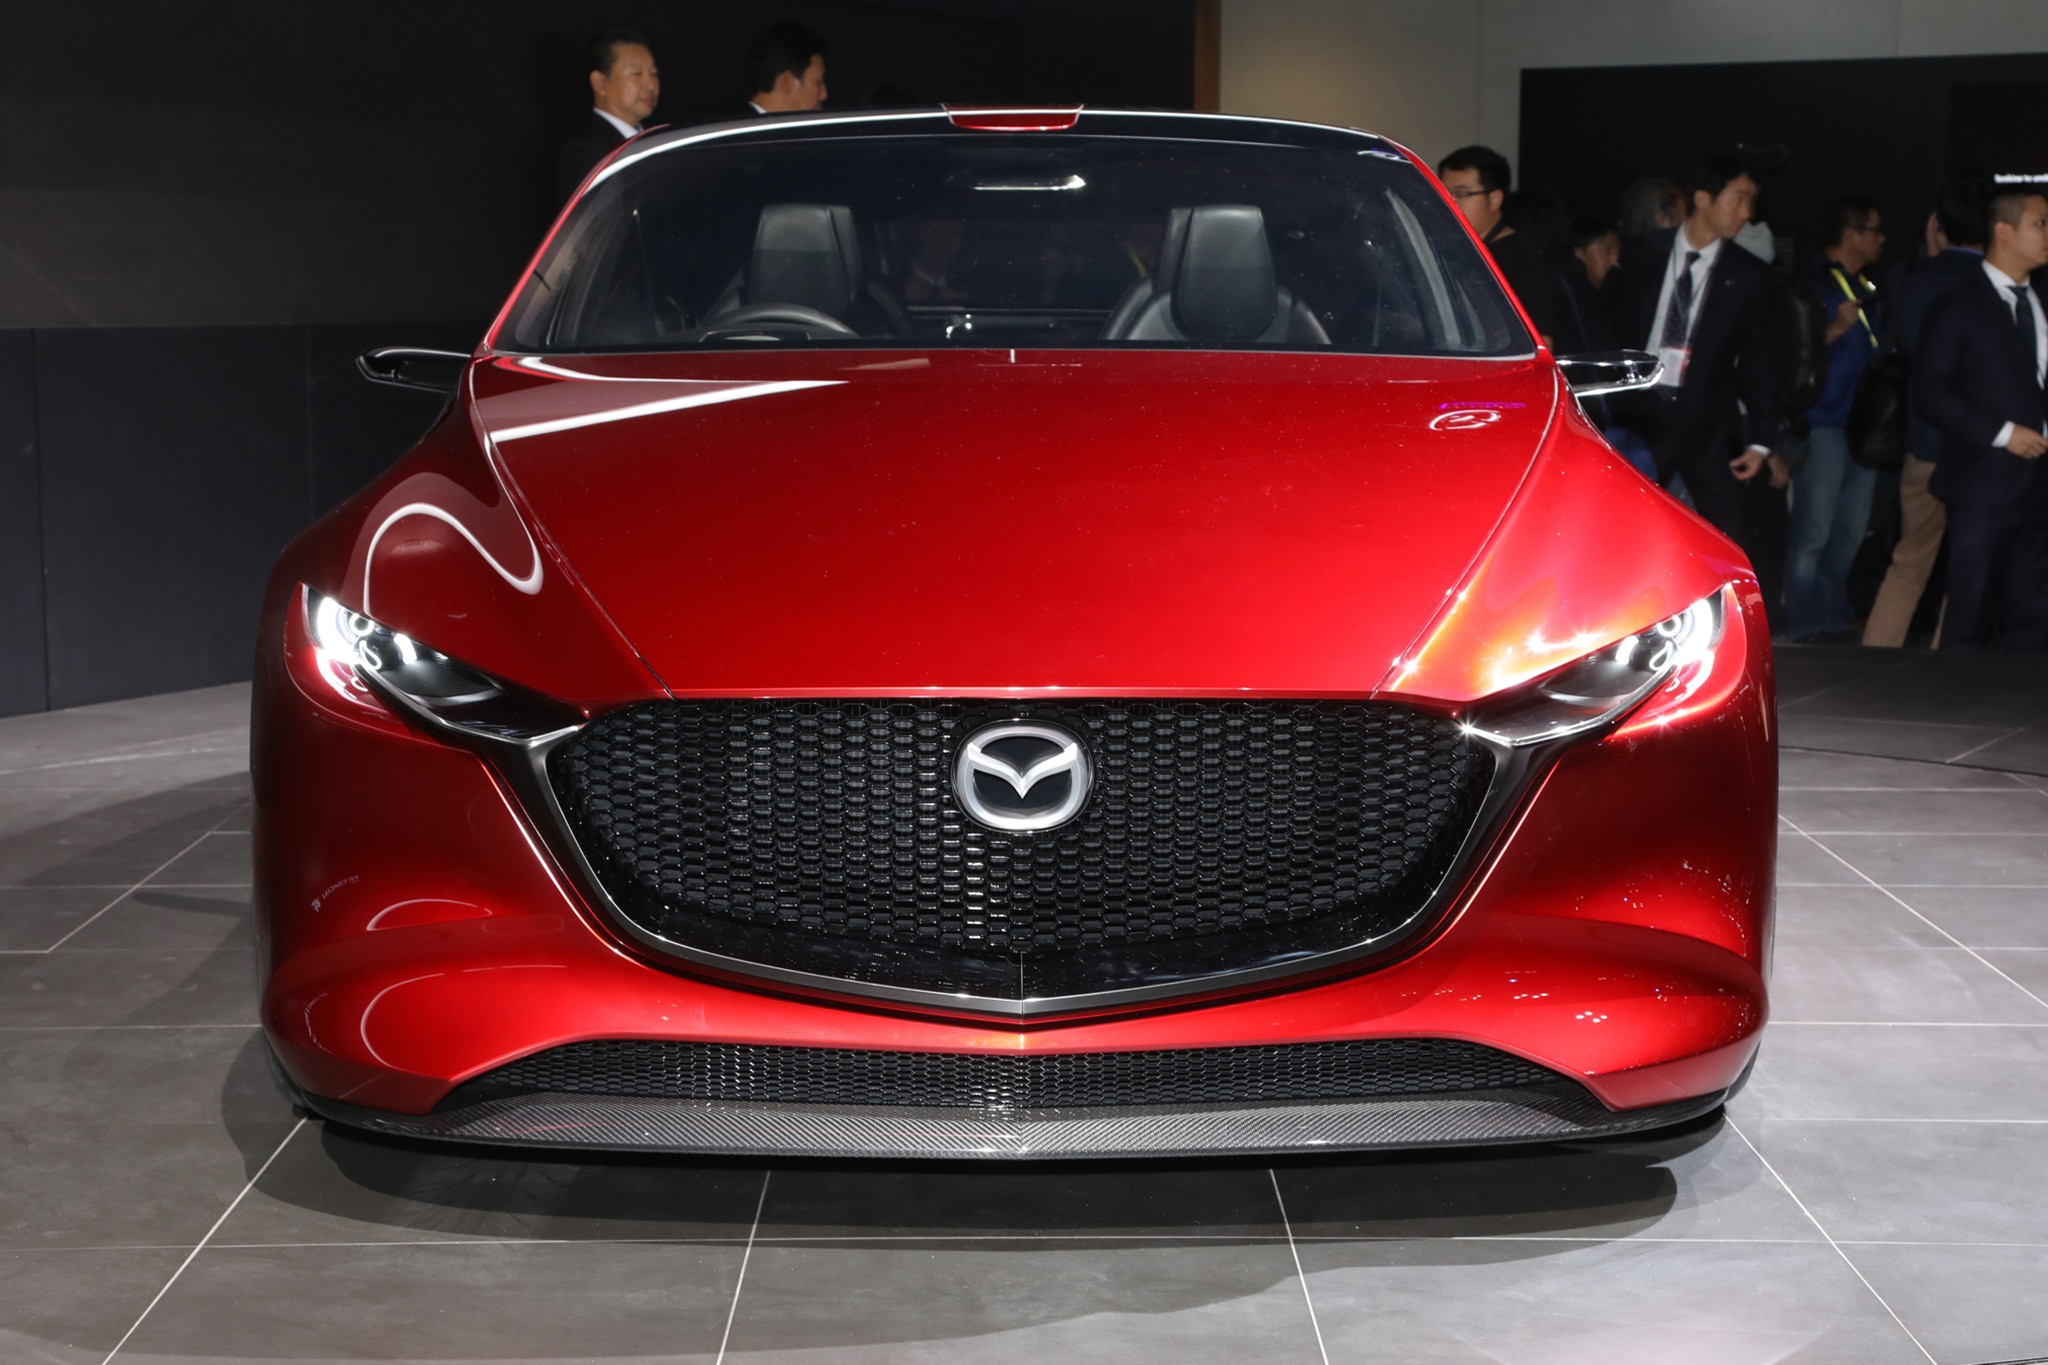 http://st.automobilemag.com/uploads/sites/11/2017/10/Mazda-Kai-concept-front.jpg